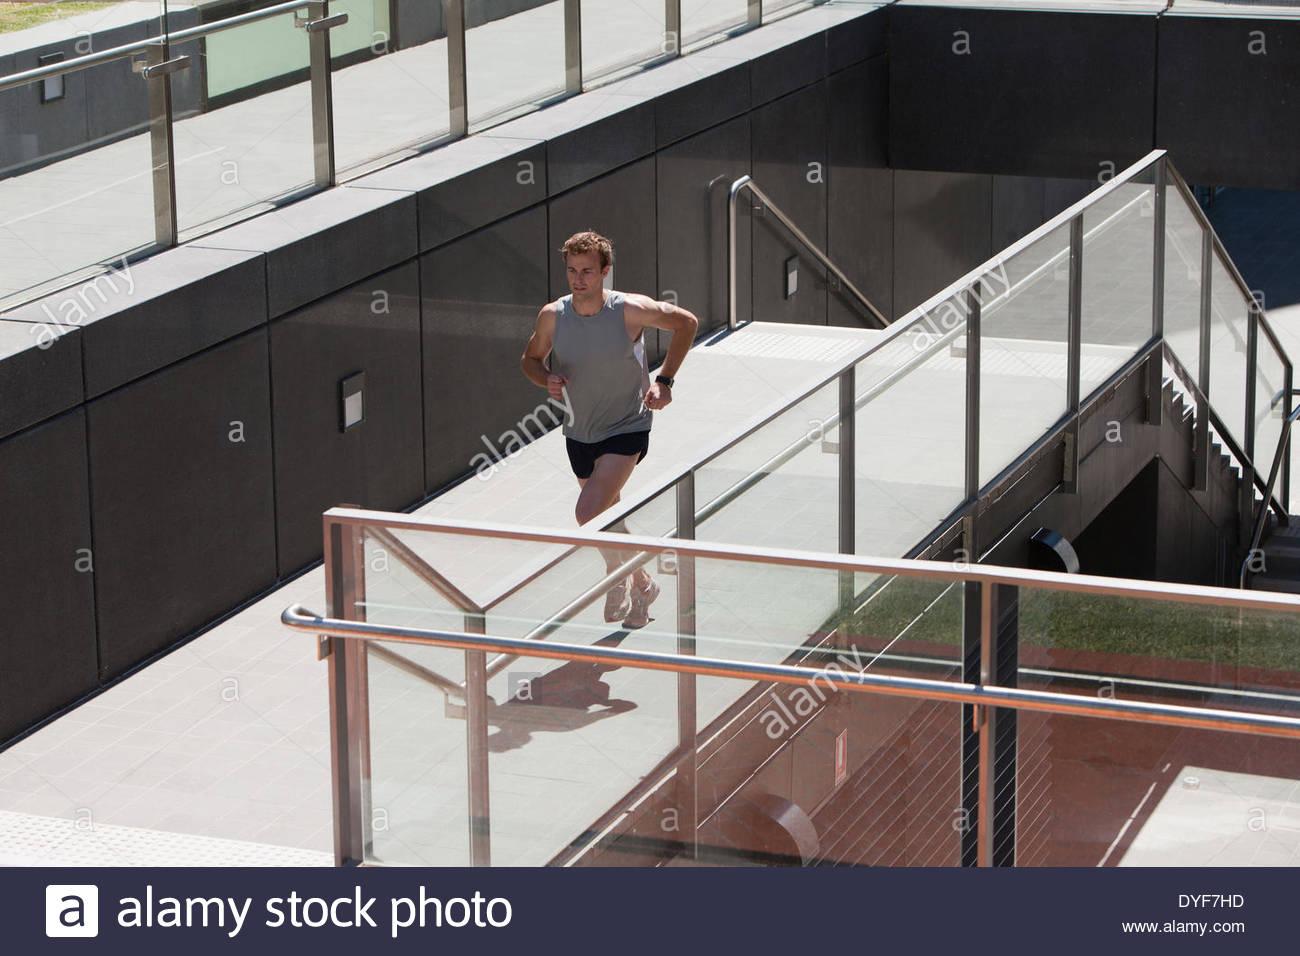 Man running - Stock Image